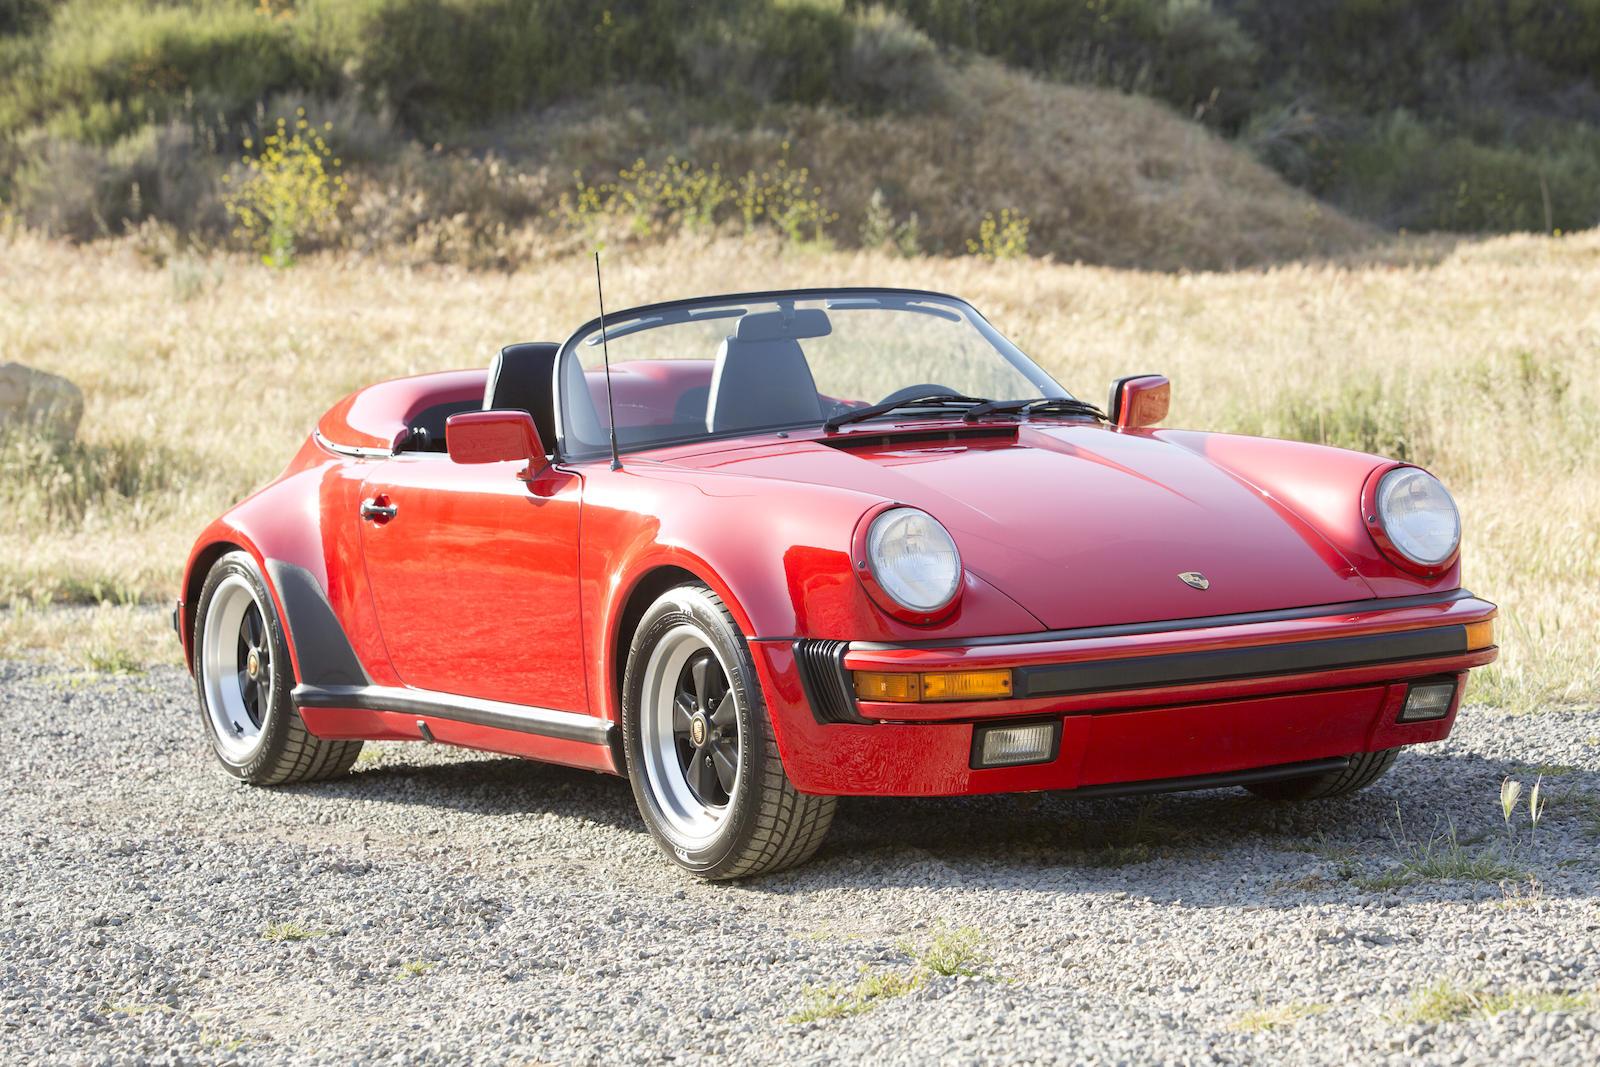 Porsche 911 Speedster 1989 Sprzedane Giełda Klasyk 243 W